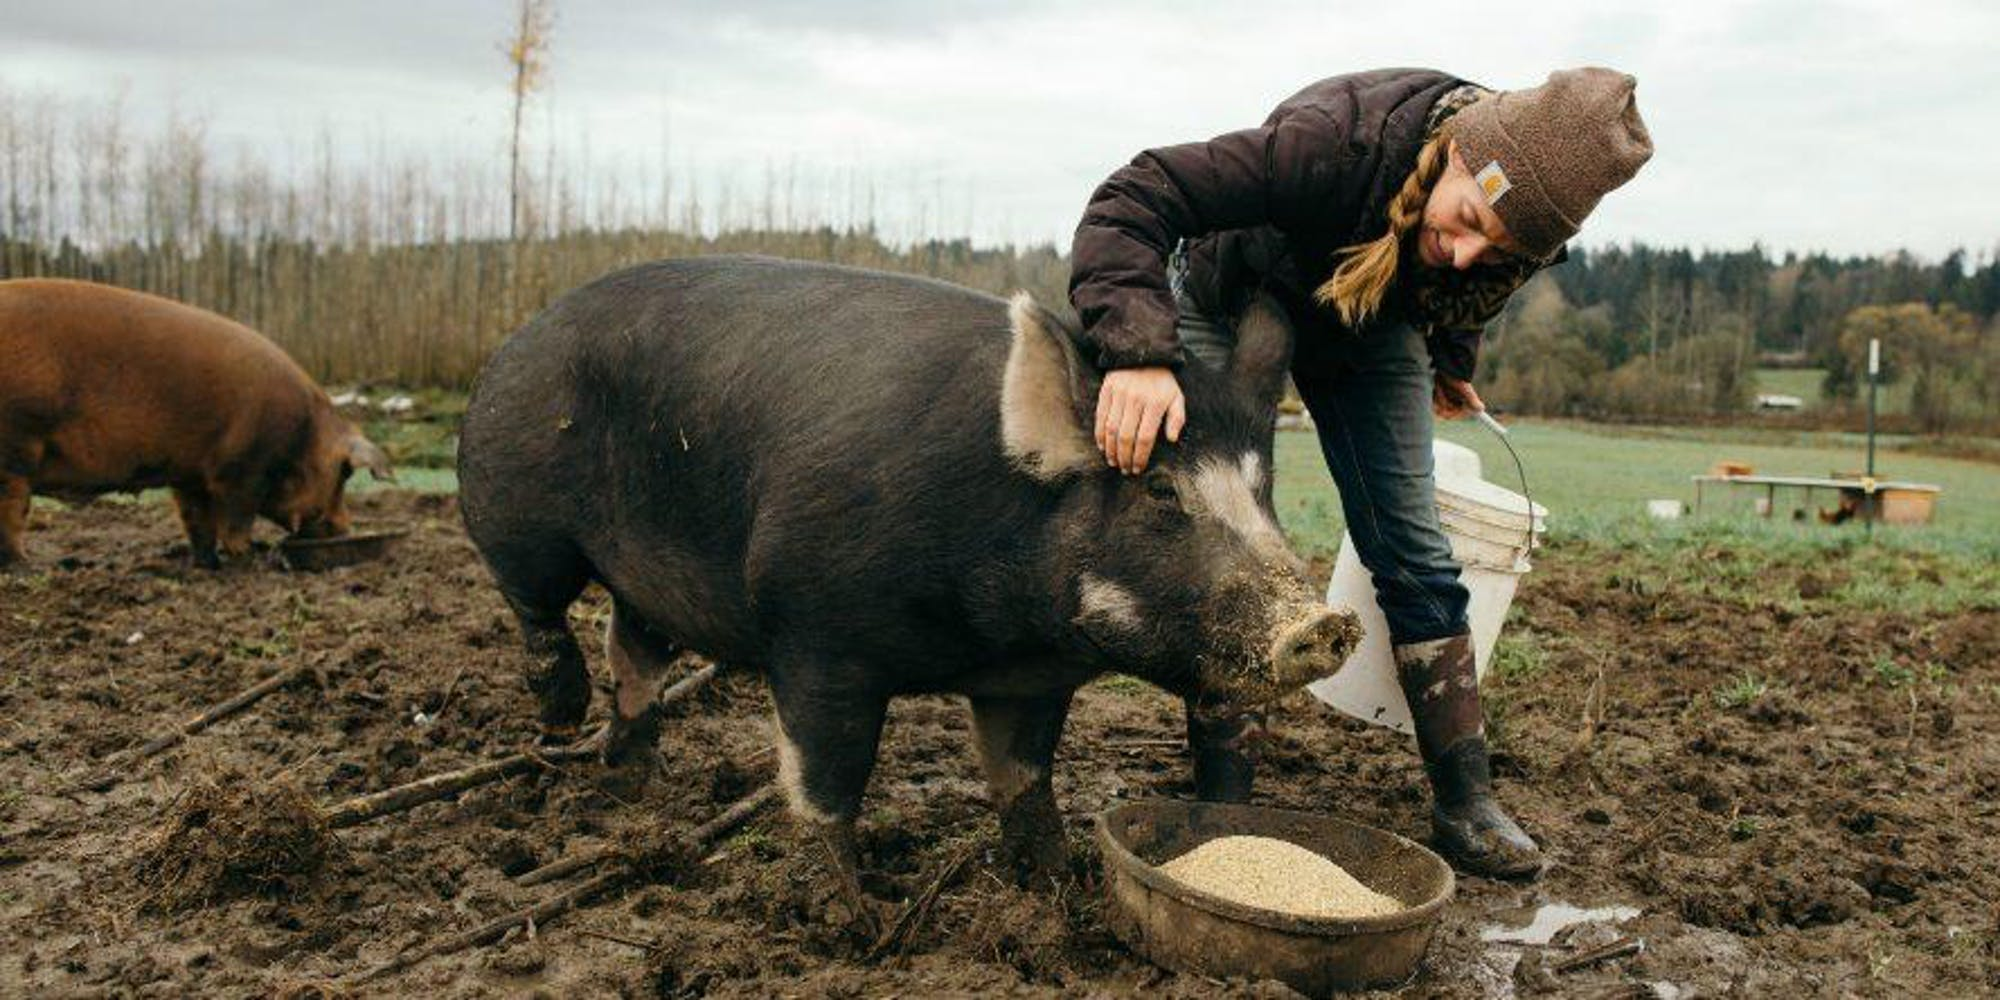 Women Farmer Fundraiser